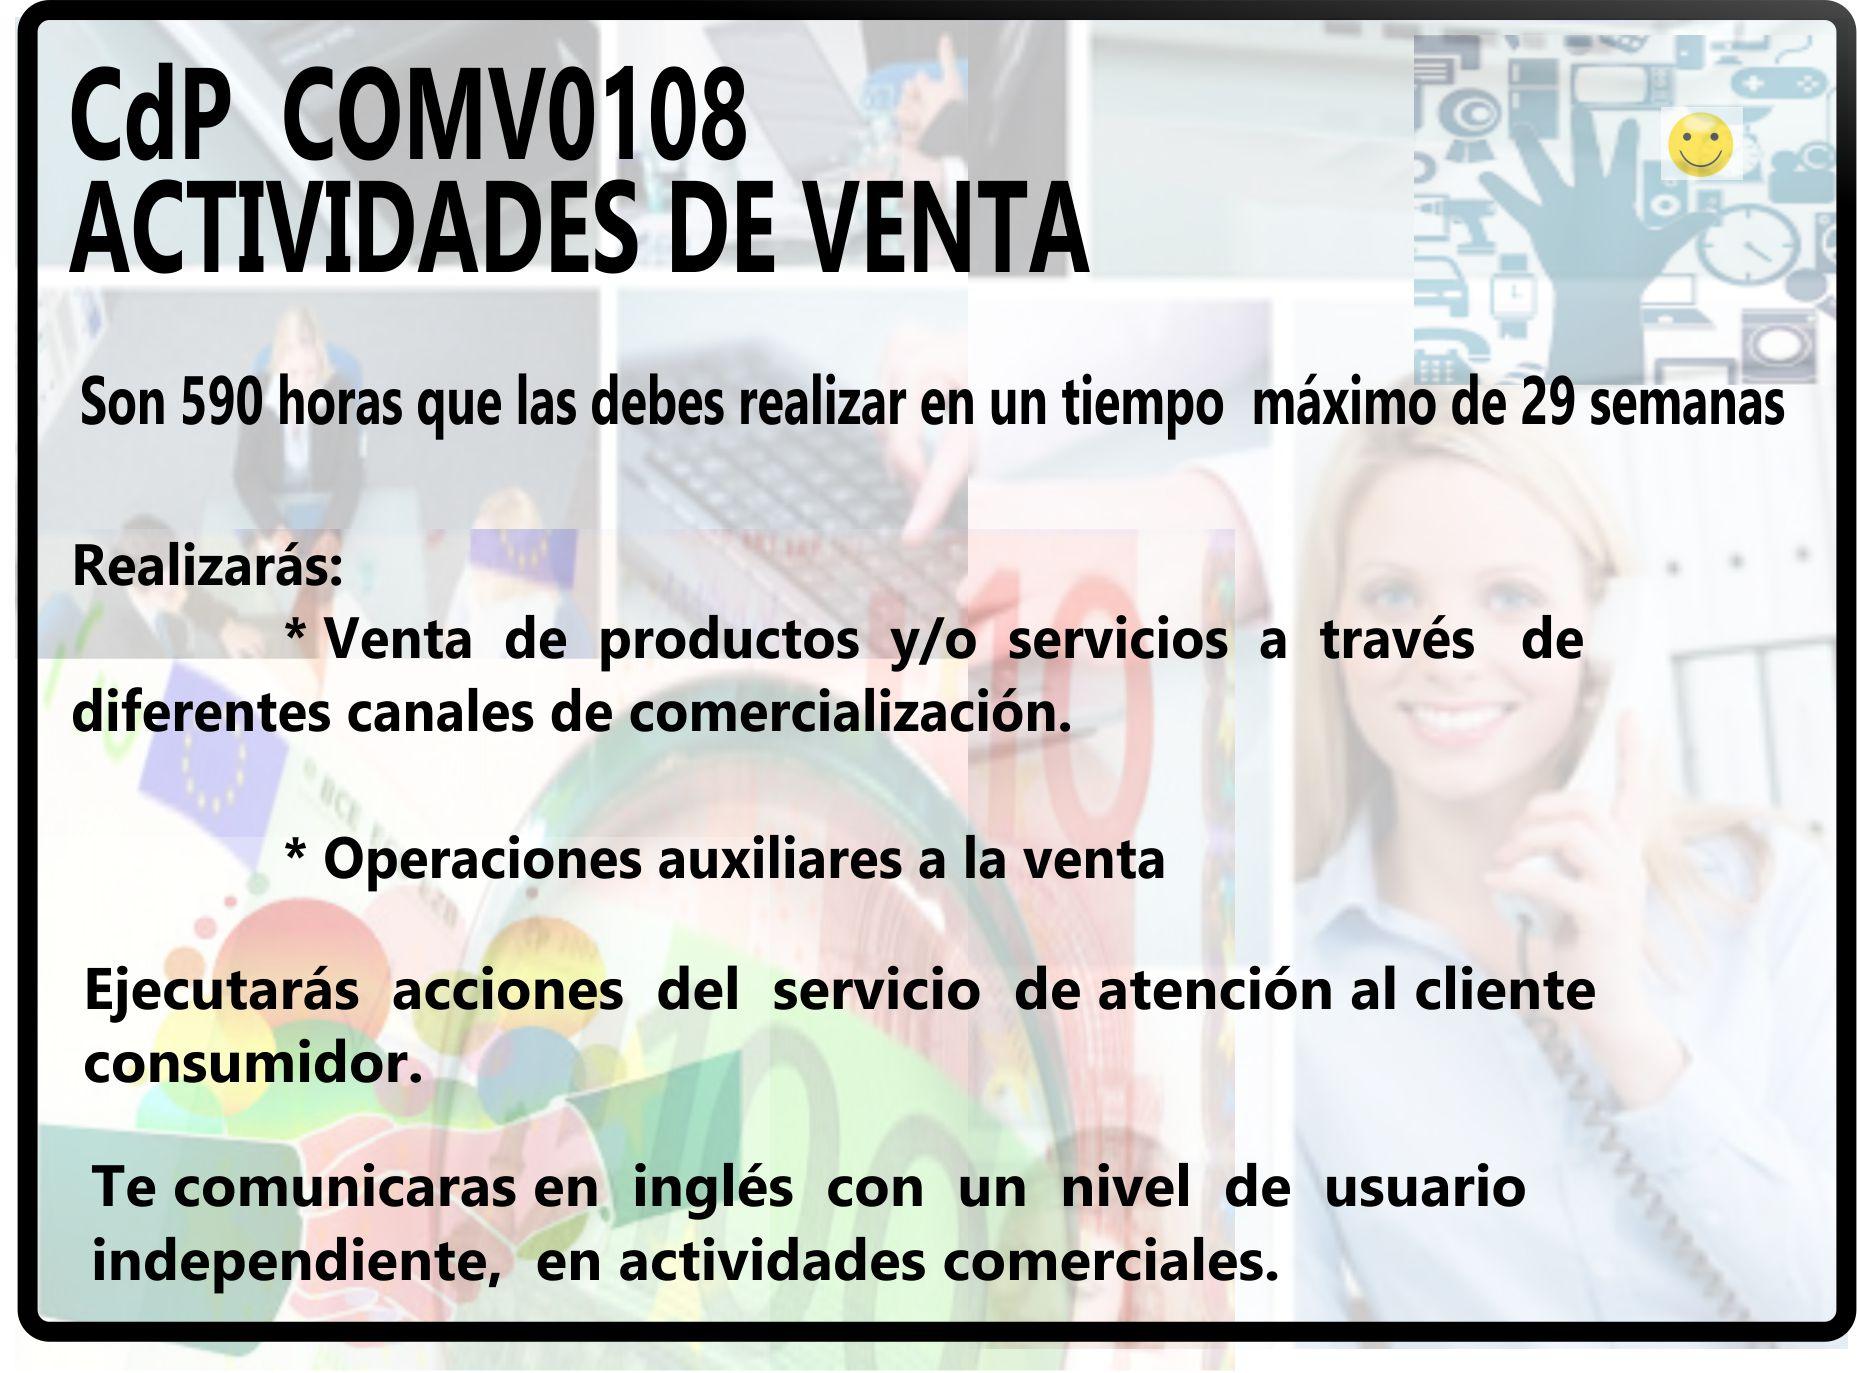 ficha CdP COMV108